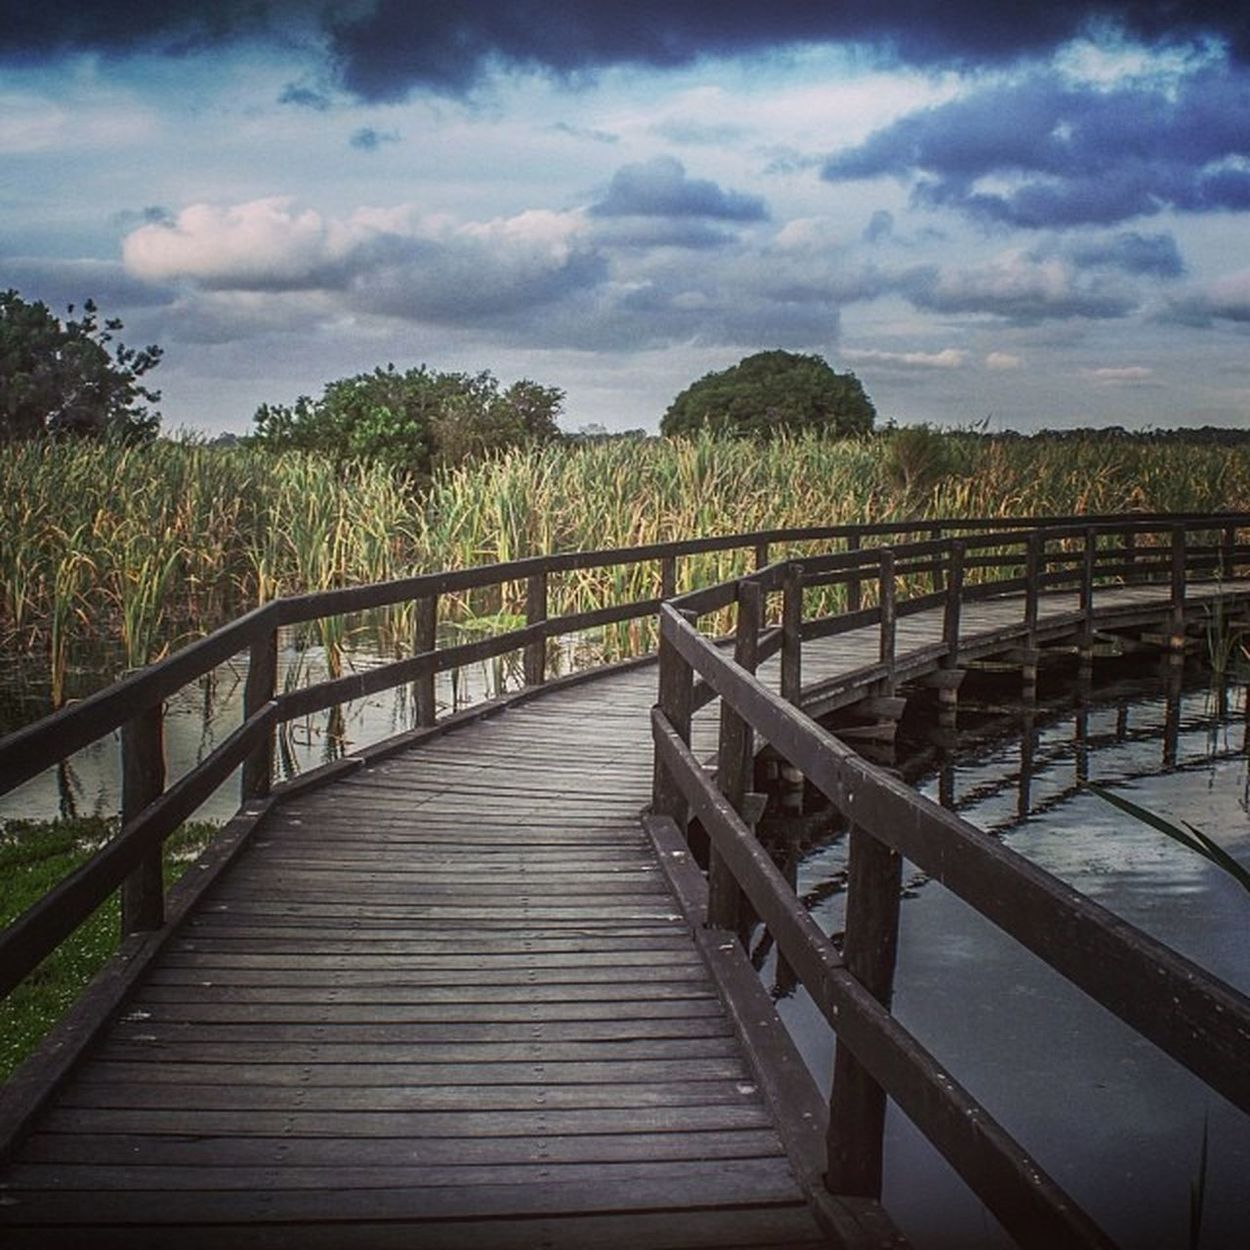 Herdsman lake regional park